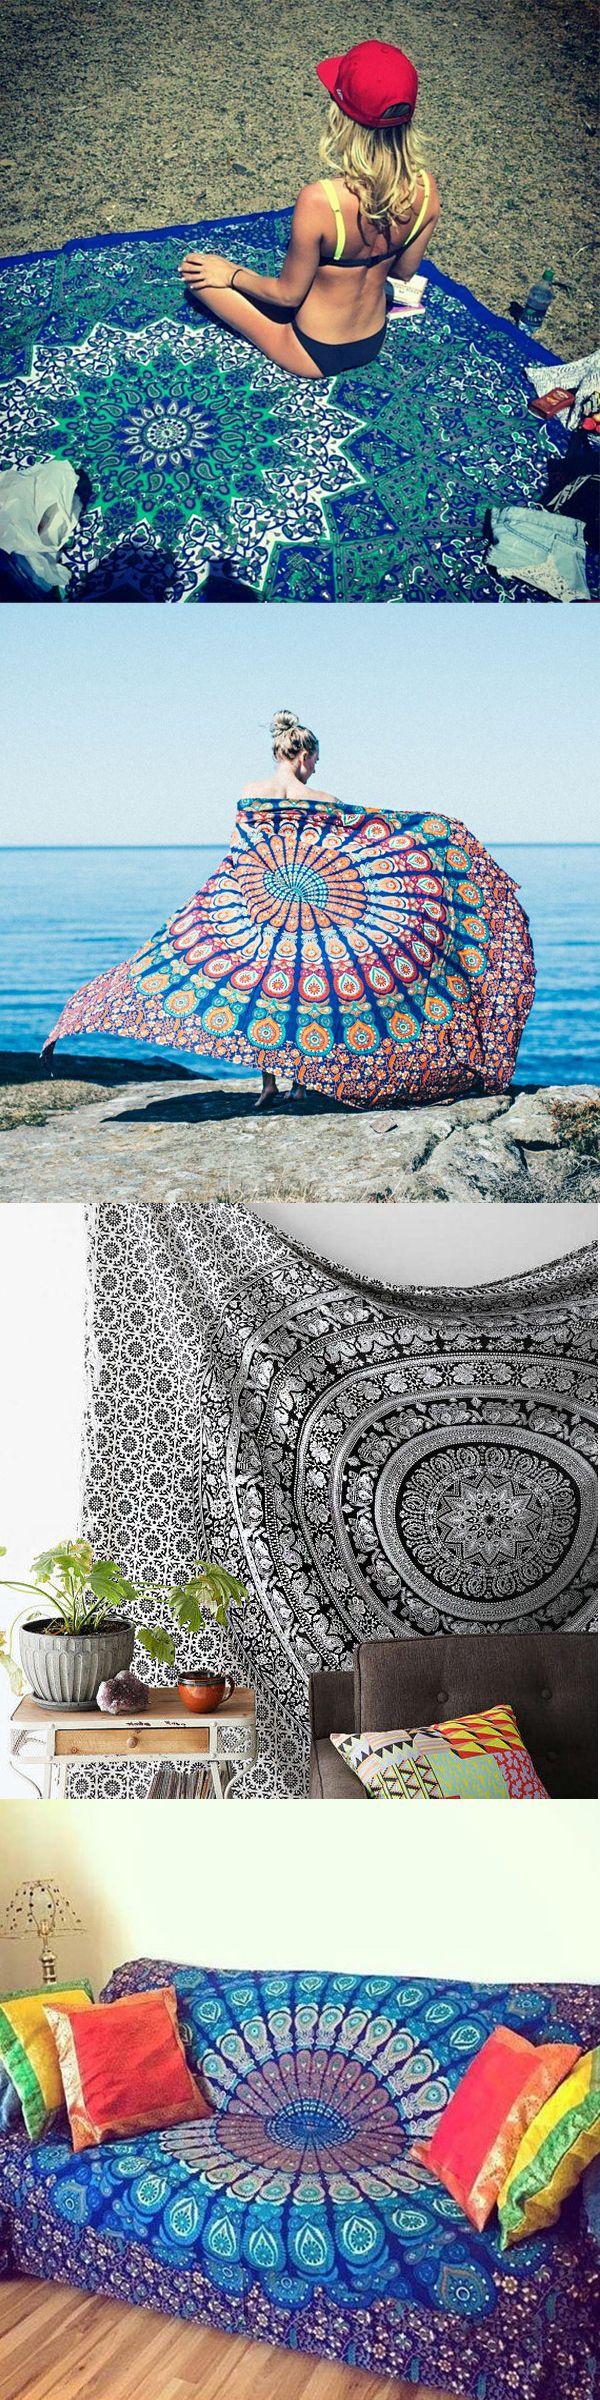 $14.26 Bohemian Style Thin Chiffon Beach Yoga Towel Bed-Sheet Tapestry  beach outfits home decor diy home decor home decor ideas 